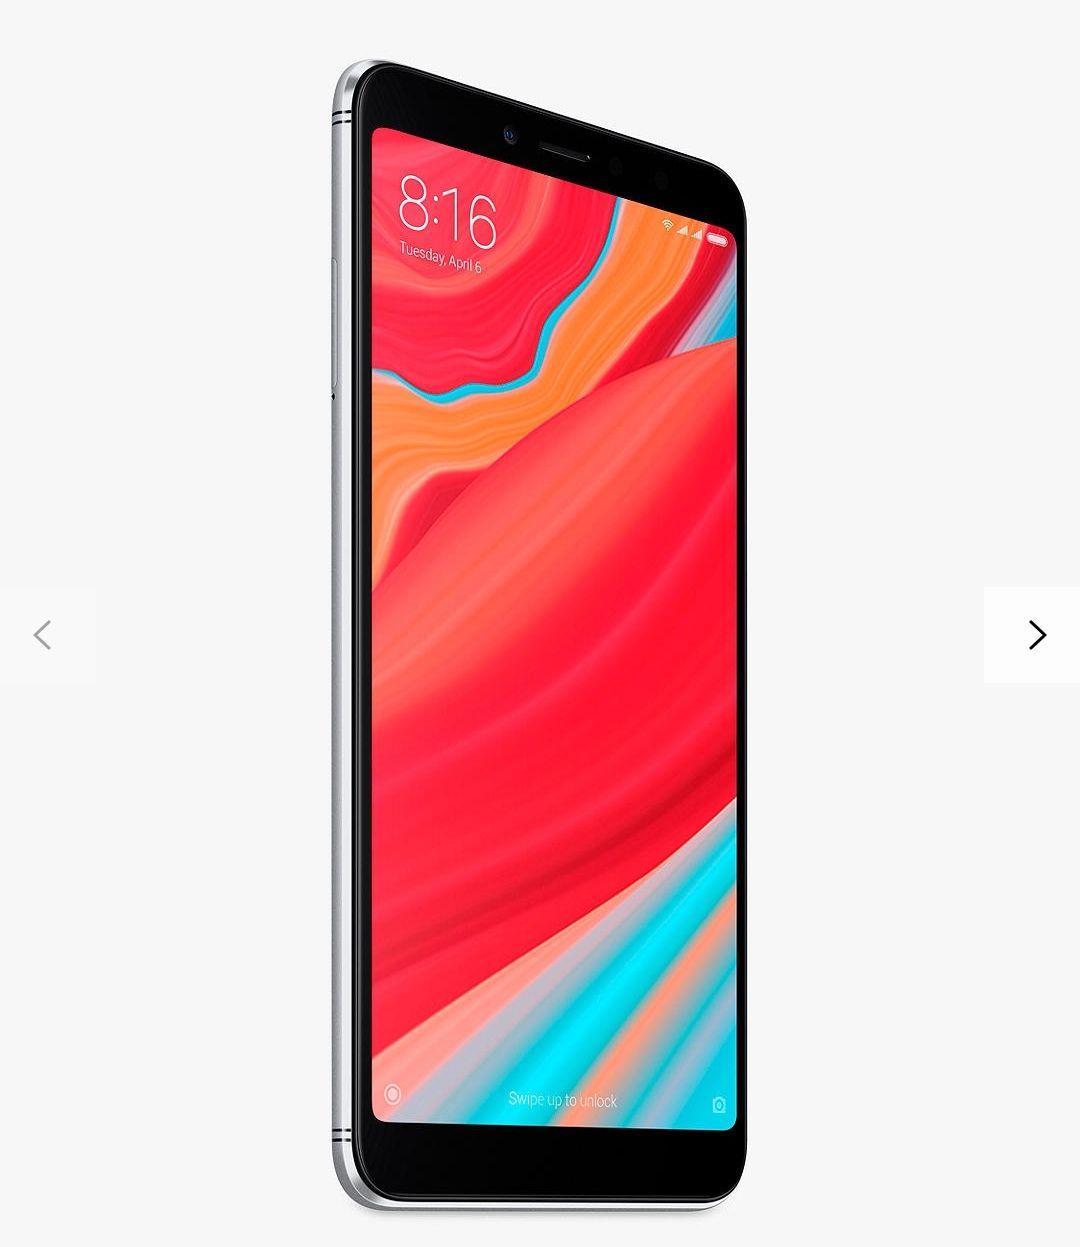 "Xiaomi Redmi S2 Dual SIM Smartphone, Android, 5.99"", 4G LTE, SIM Free, 32GB, Grey £135 @ John Lewis & Partners"